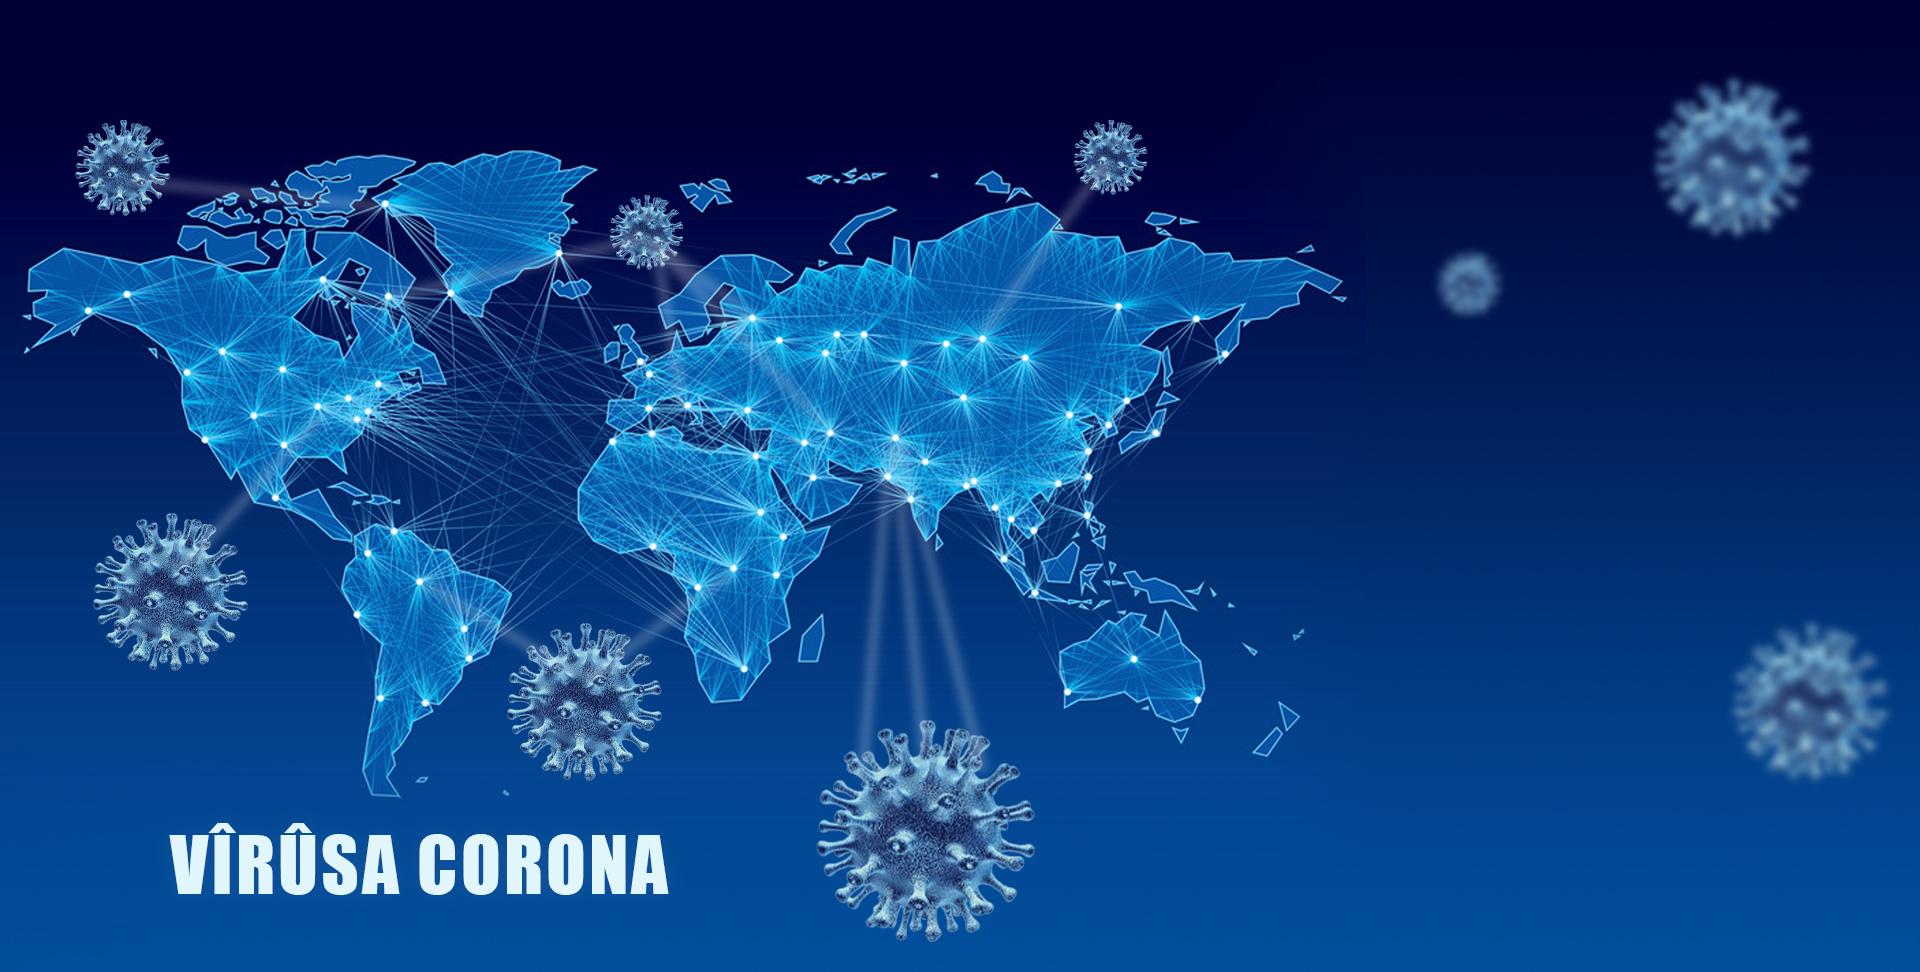 CORONA – THE NEXT QUANTUM MOMENT